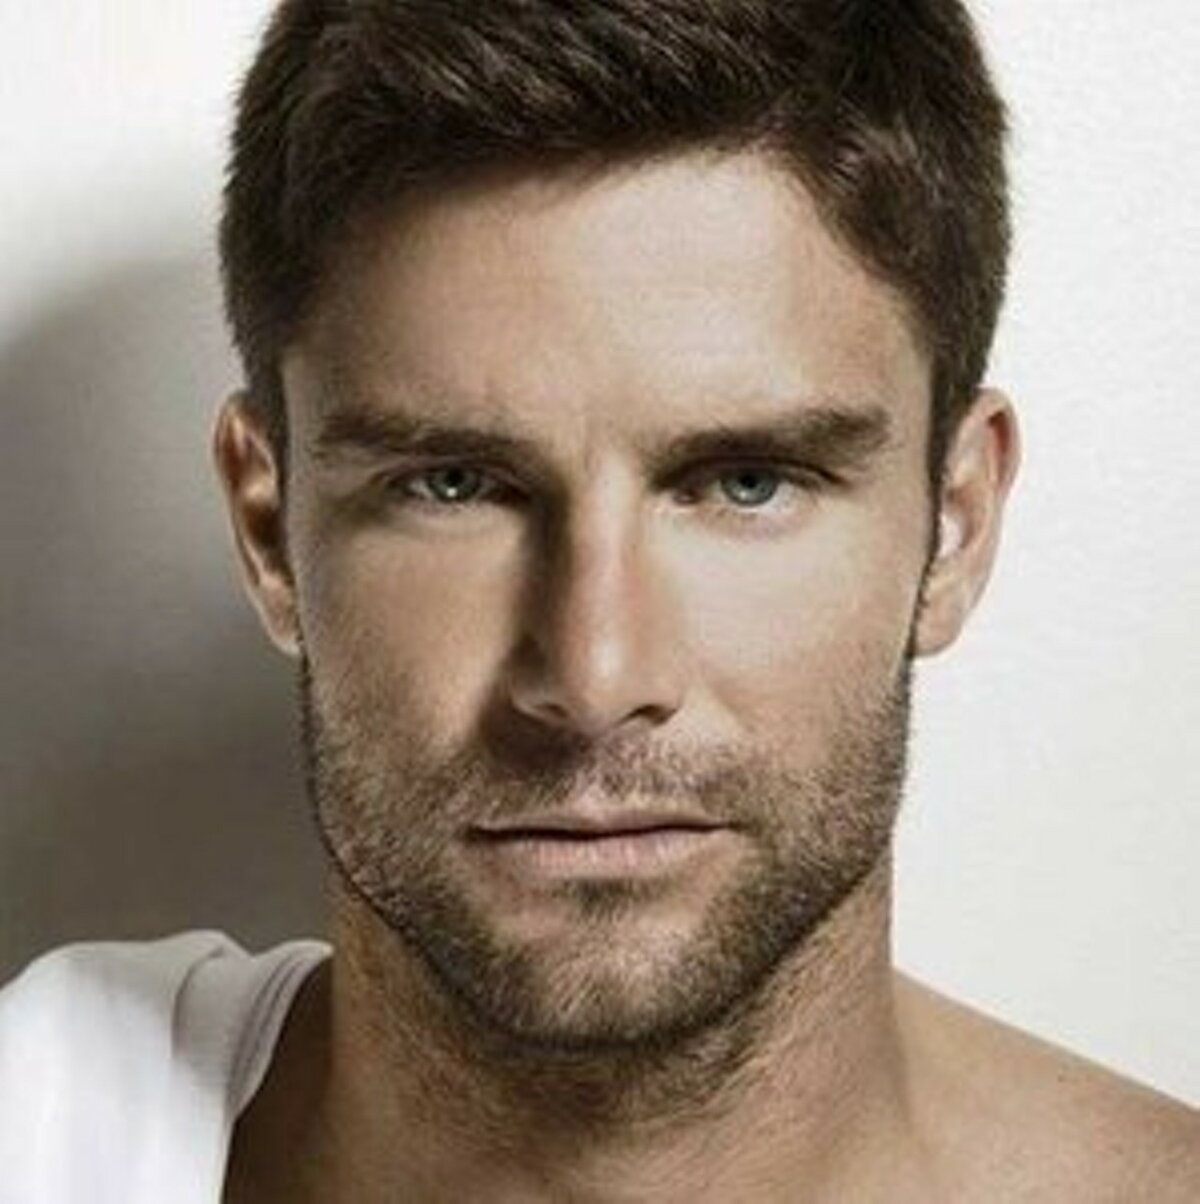 мужские стрижки на лице в картинках обоев